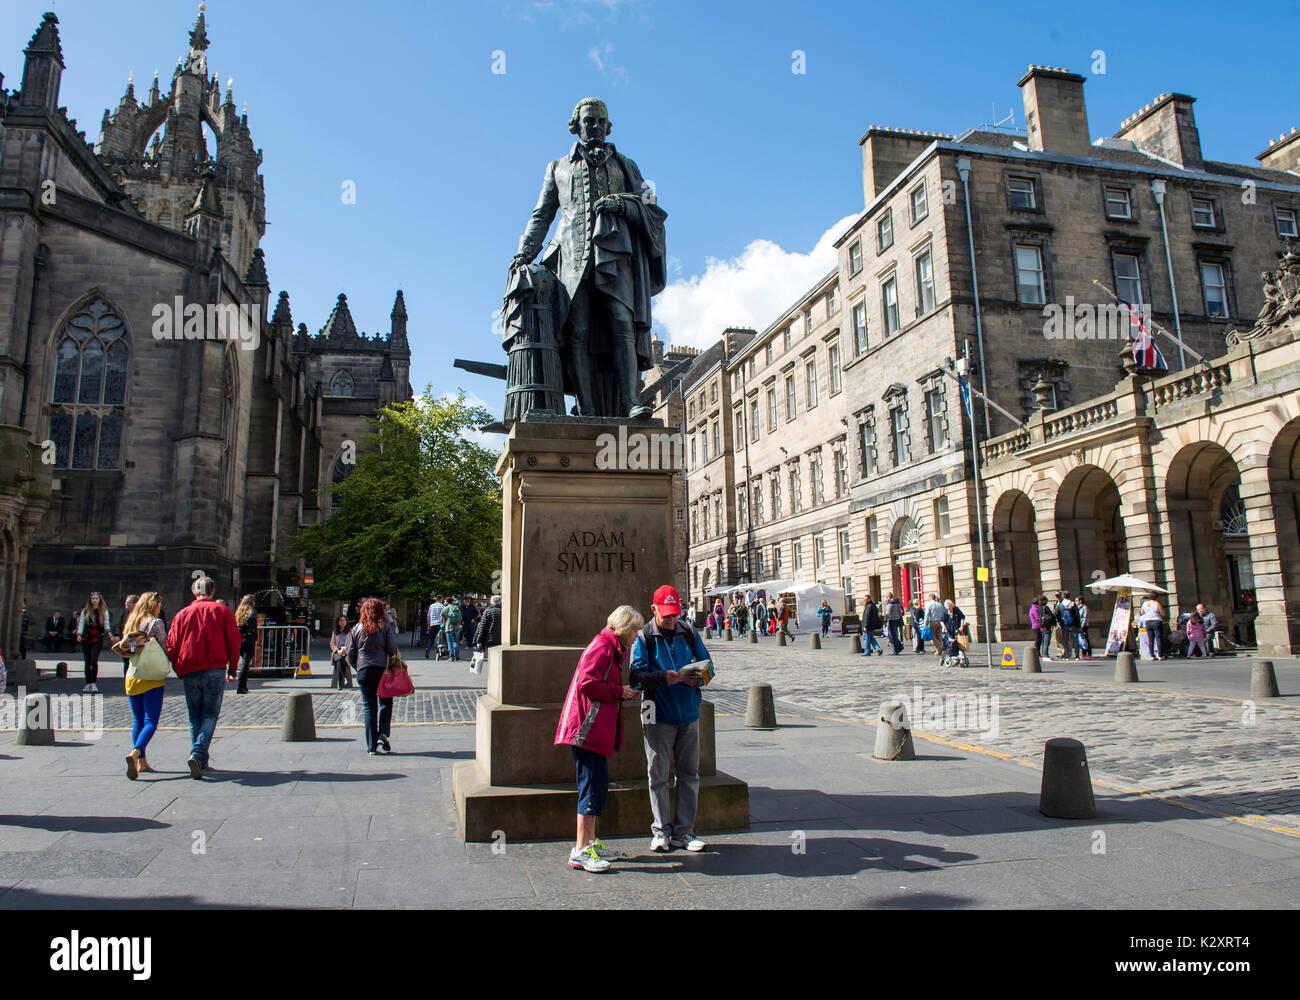 Tourists under the Adam Smith statue on Edinburgh's Royal Mile. - Stock Image